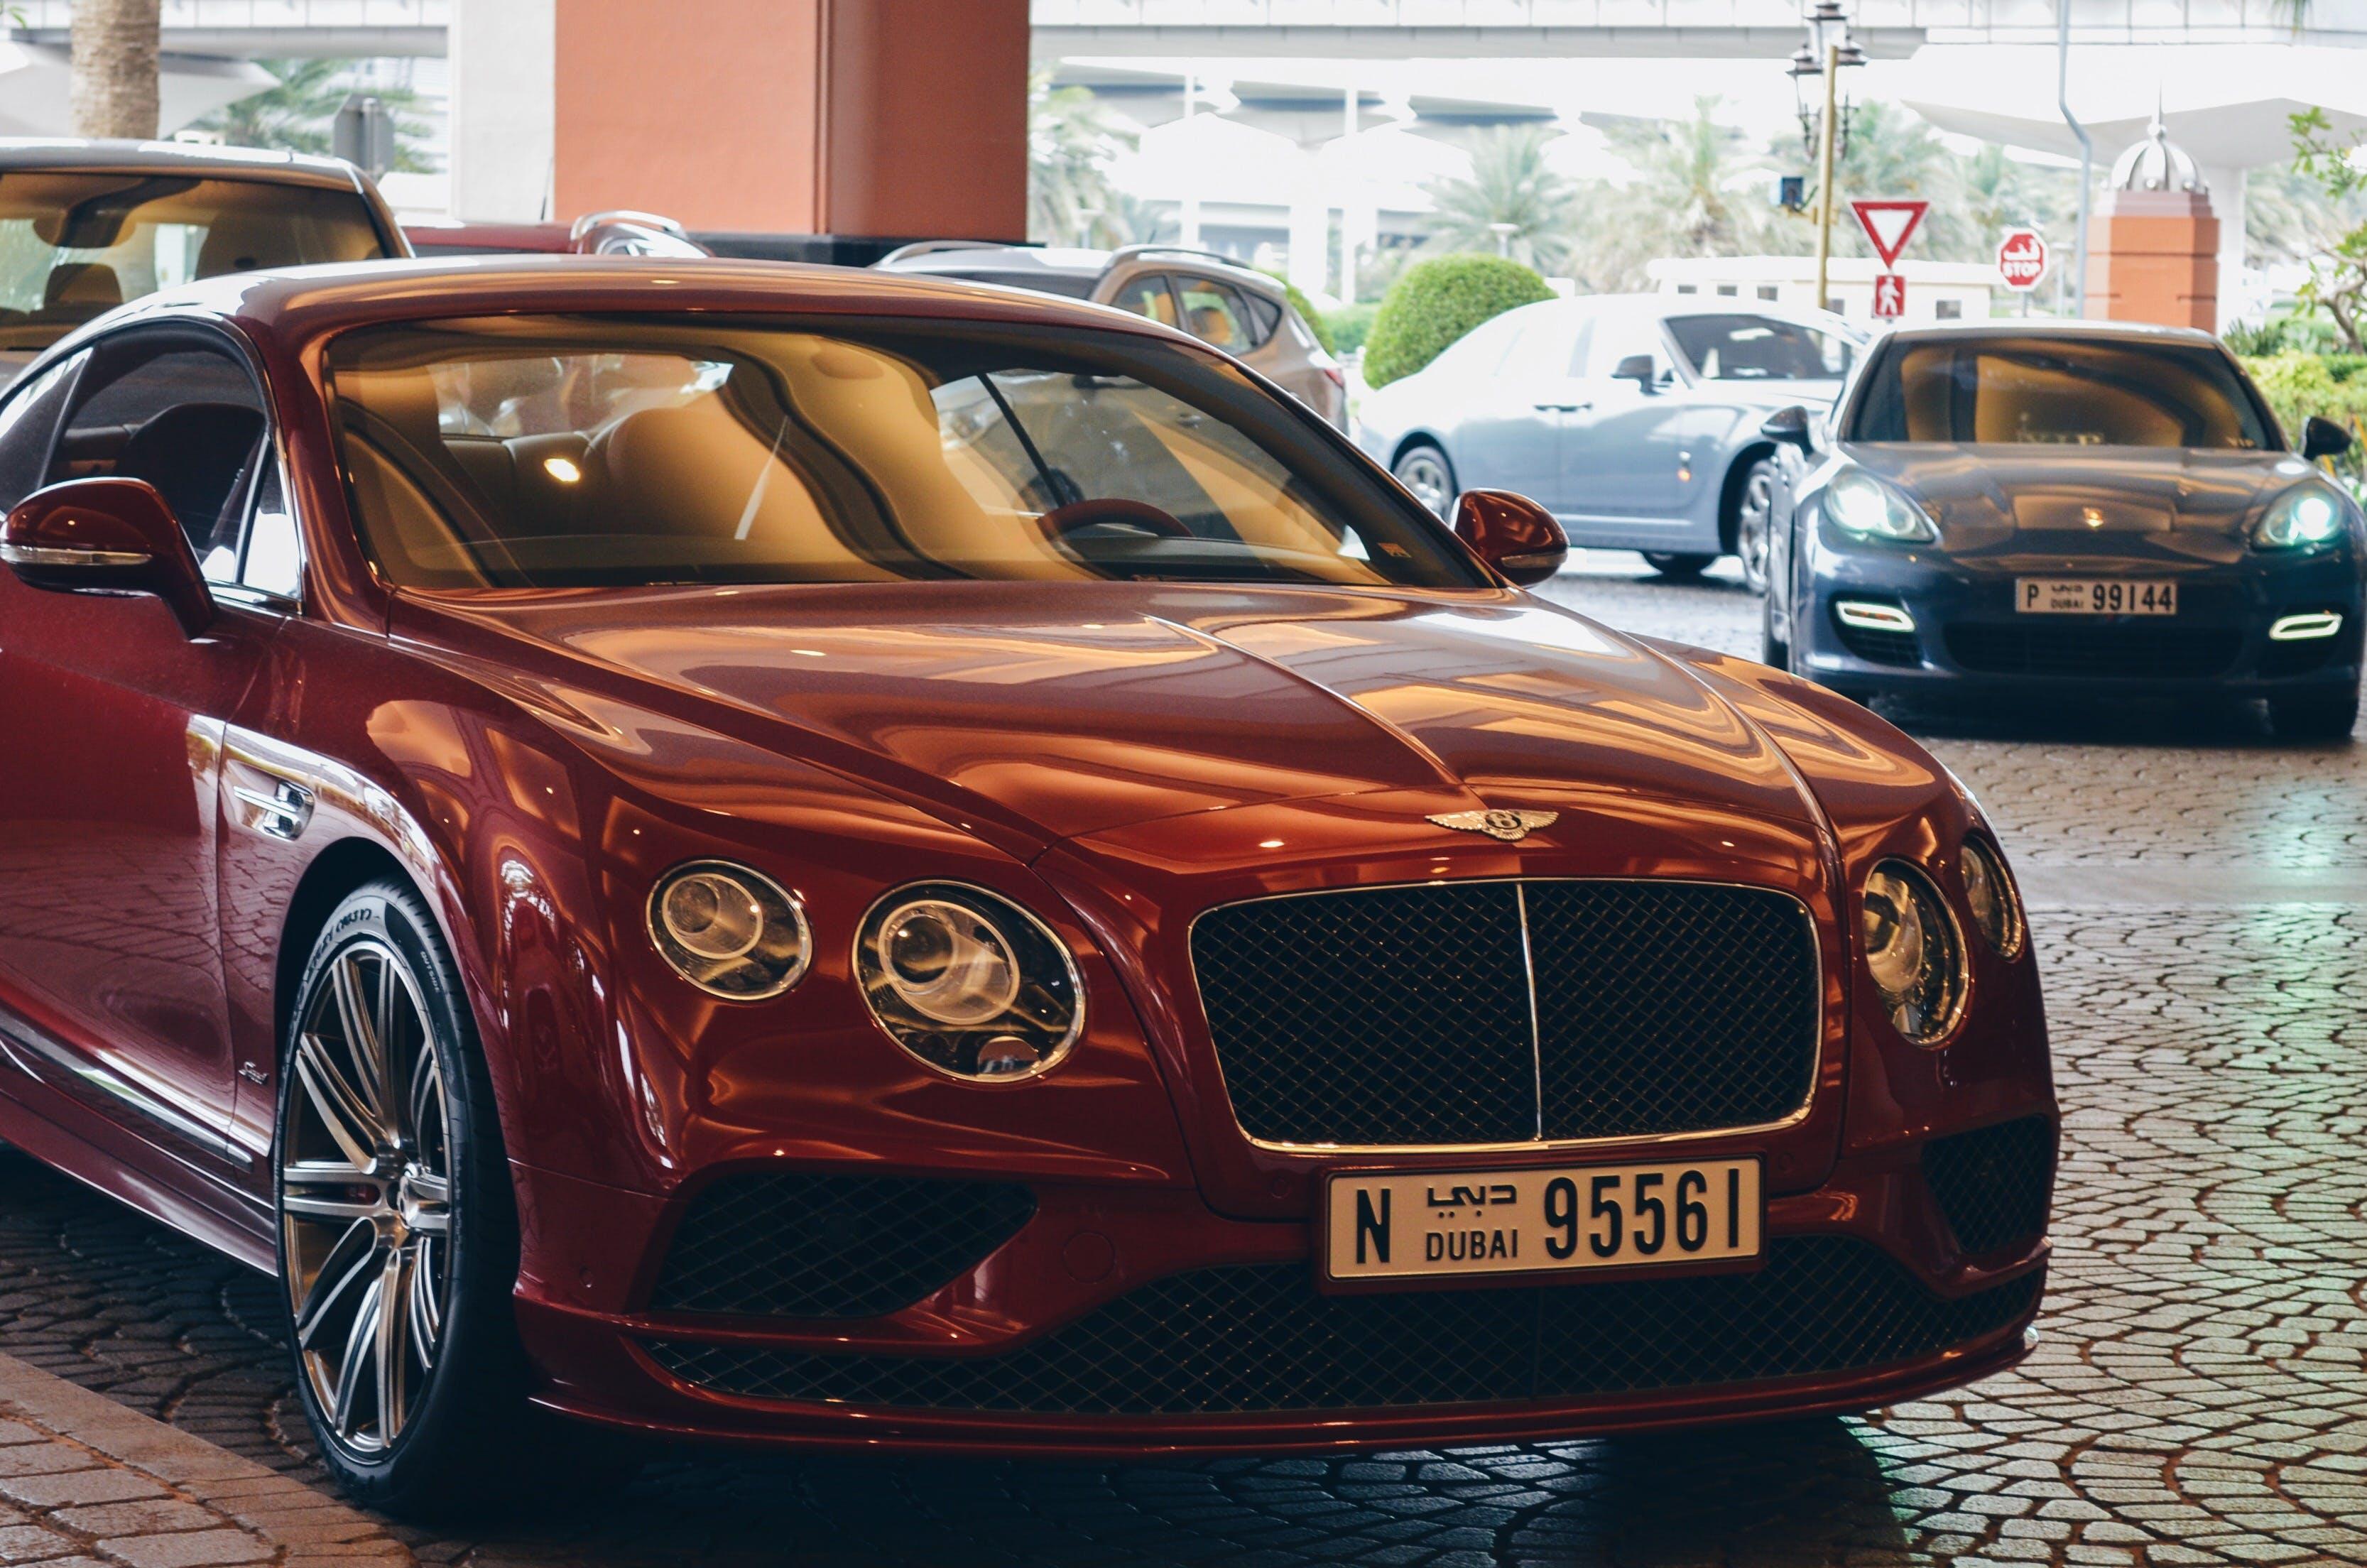 Free stock photo of car, luxury, luxury car, continental